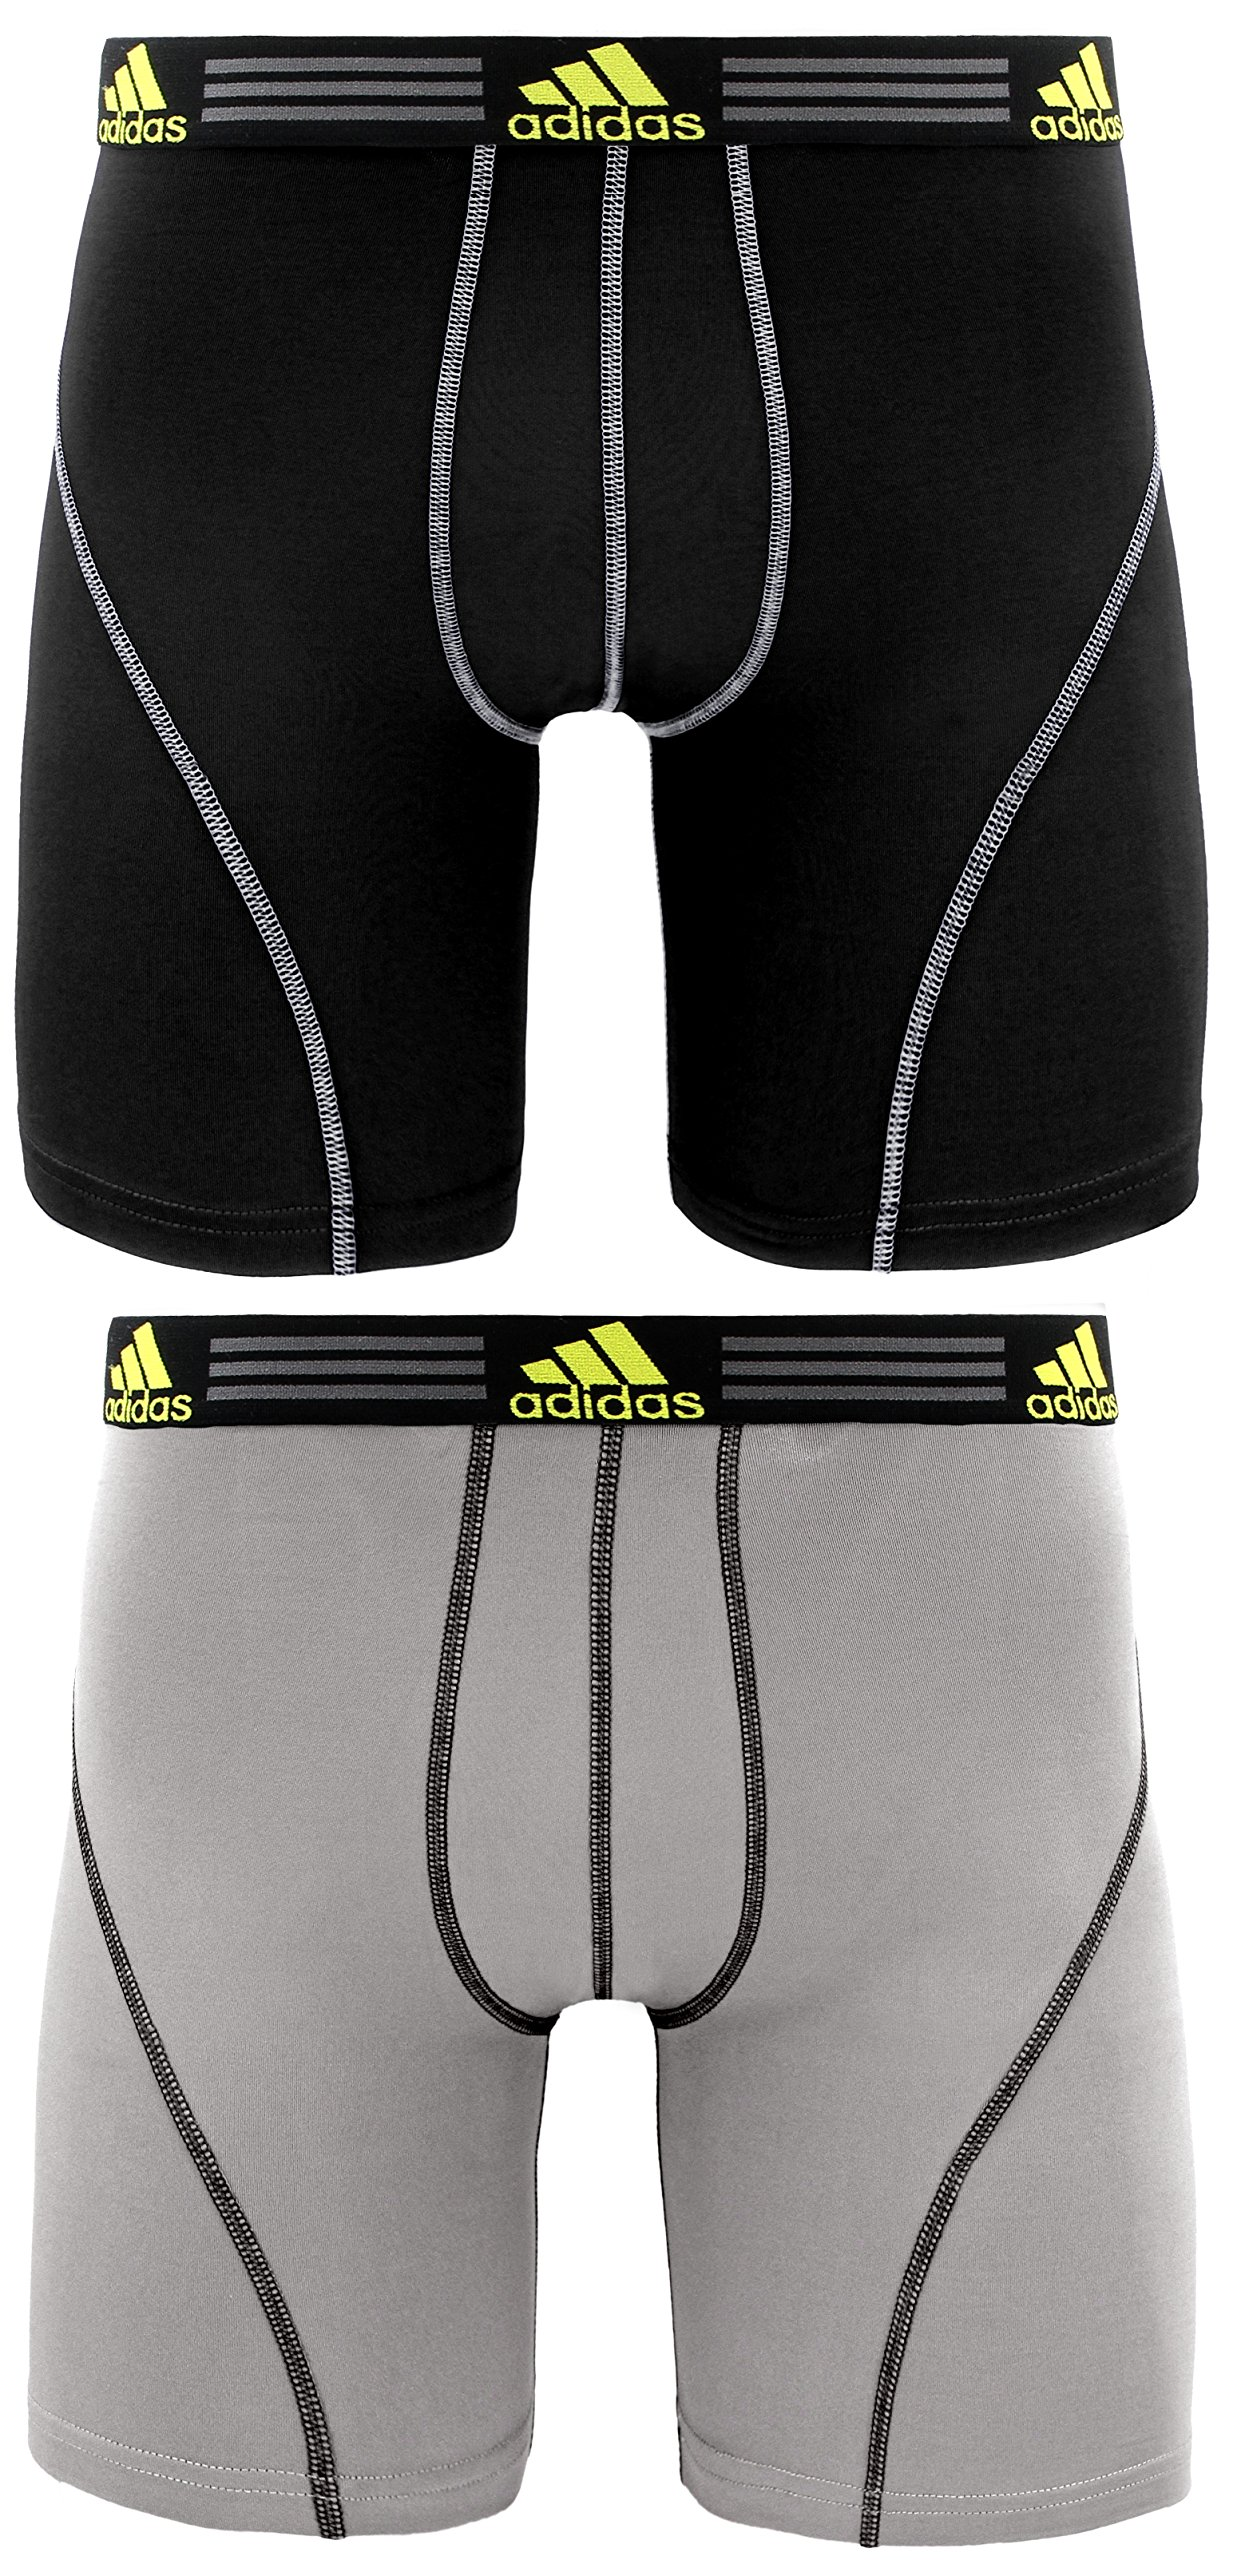 adidas Men's Sport Performance Midway Underwear (2-Pack), Light Onix/Black Black/Light Onix, LARGE by adidas